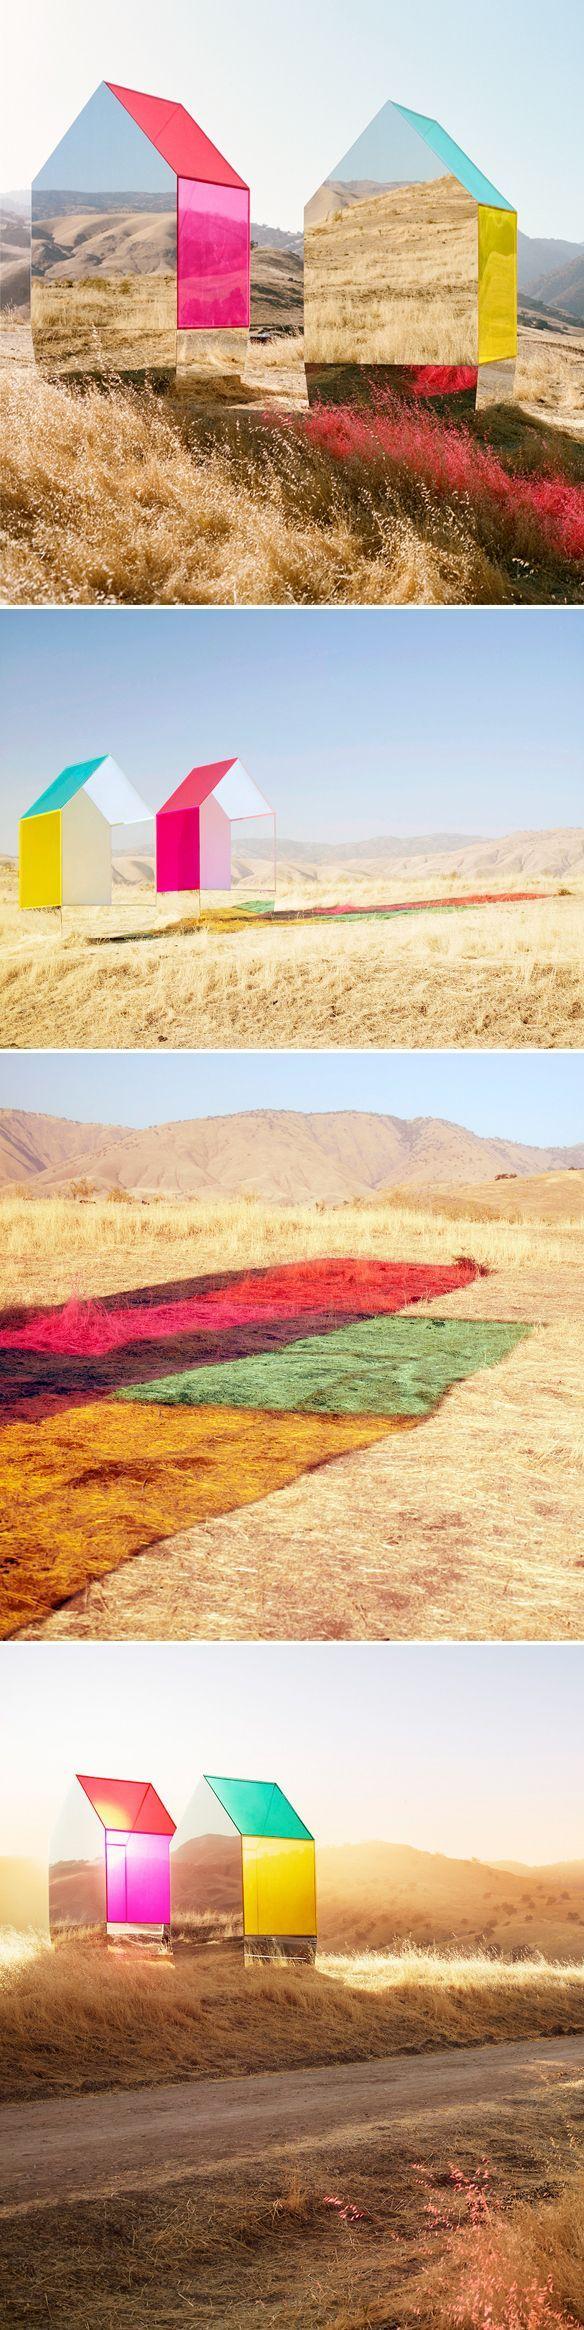 Autumn de Wilde - installation image #100likes #bestoftheday #designinspiration